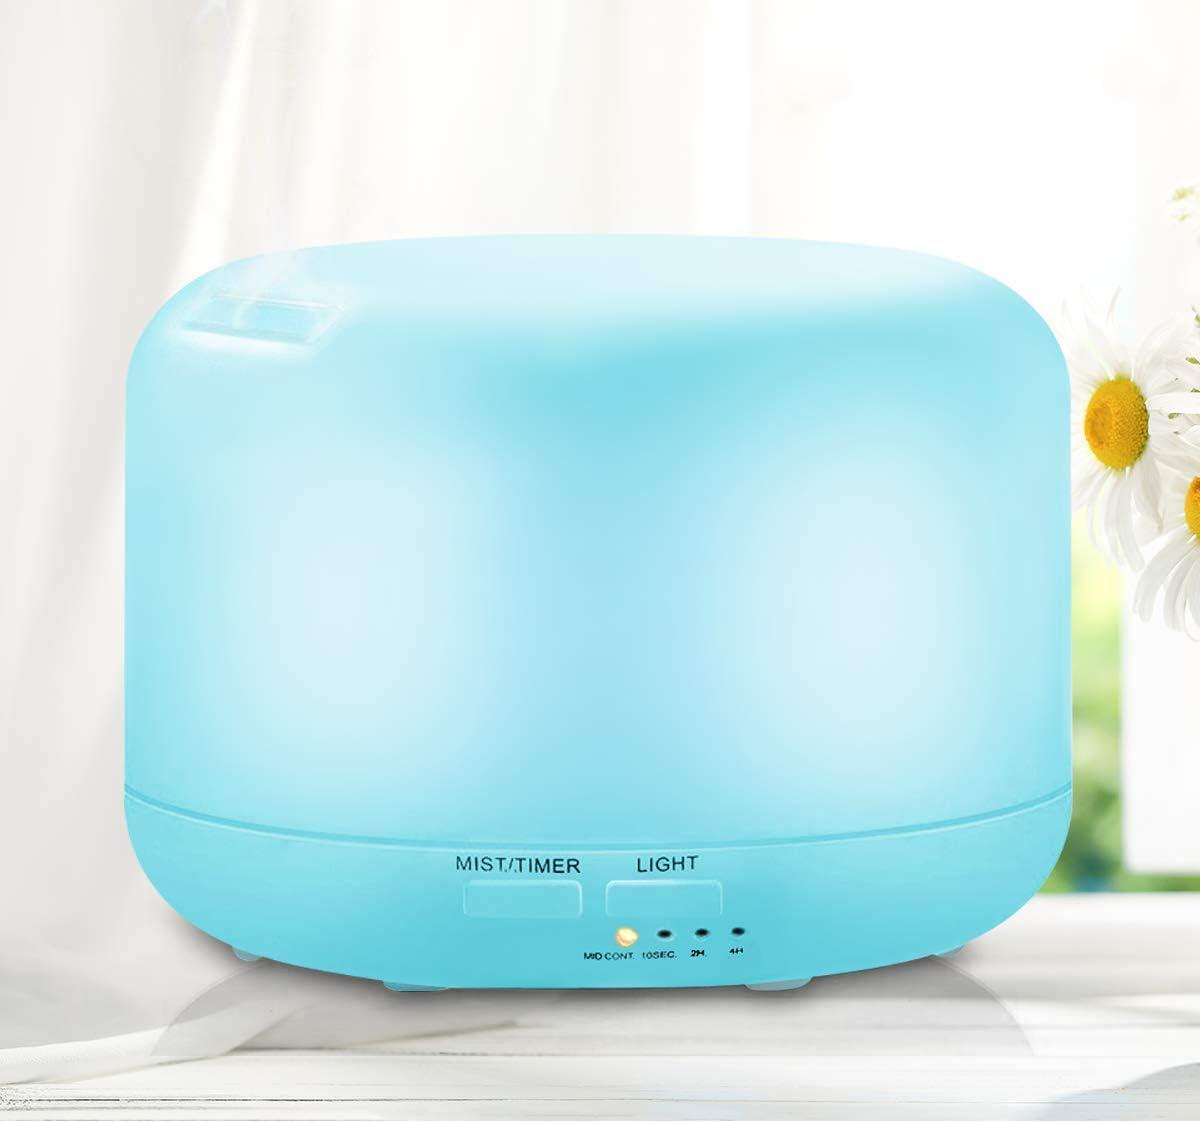 UBEGOOD Humidificador, Humidificador Ultrasónico Control Remoto Aroma Difusor purificador de Aire con LED de 7 Colores de para luminoterapia en el Hogar, Oficina, SPA, Bebé (300ml)